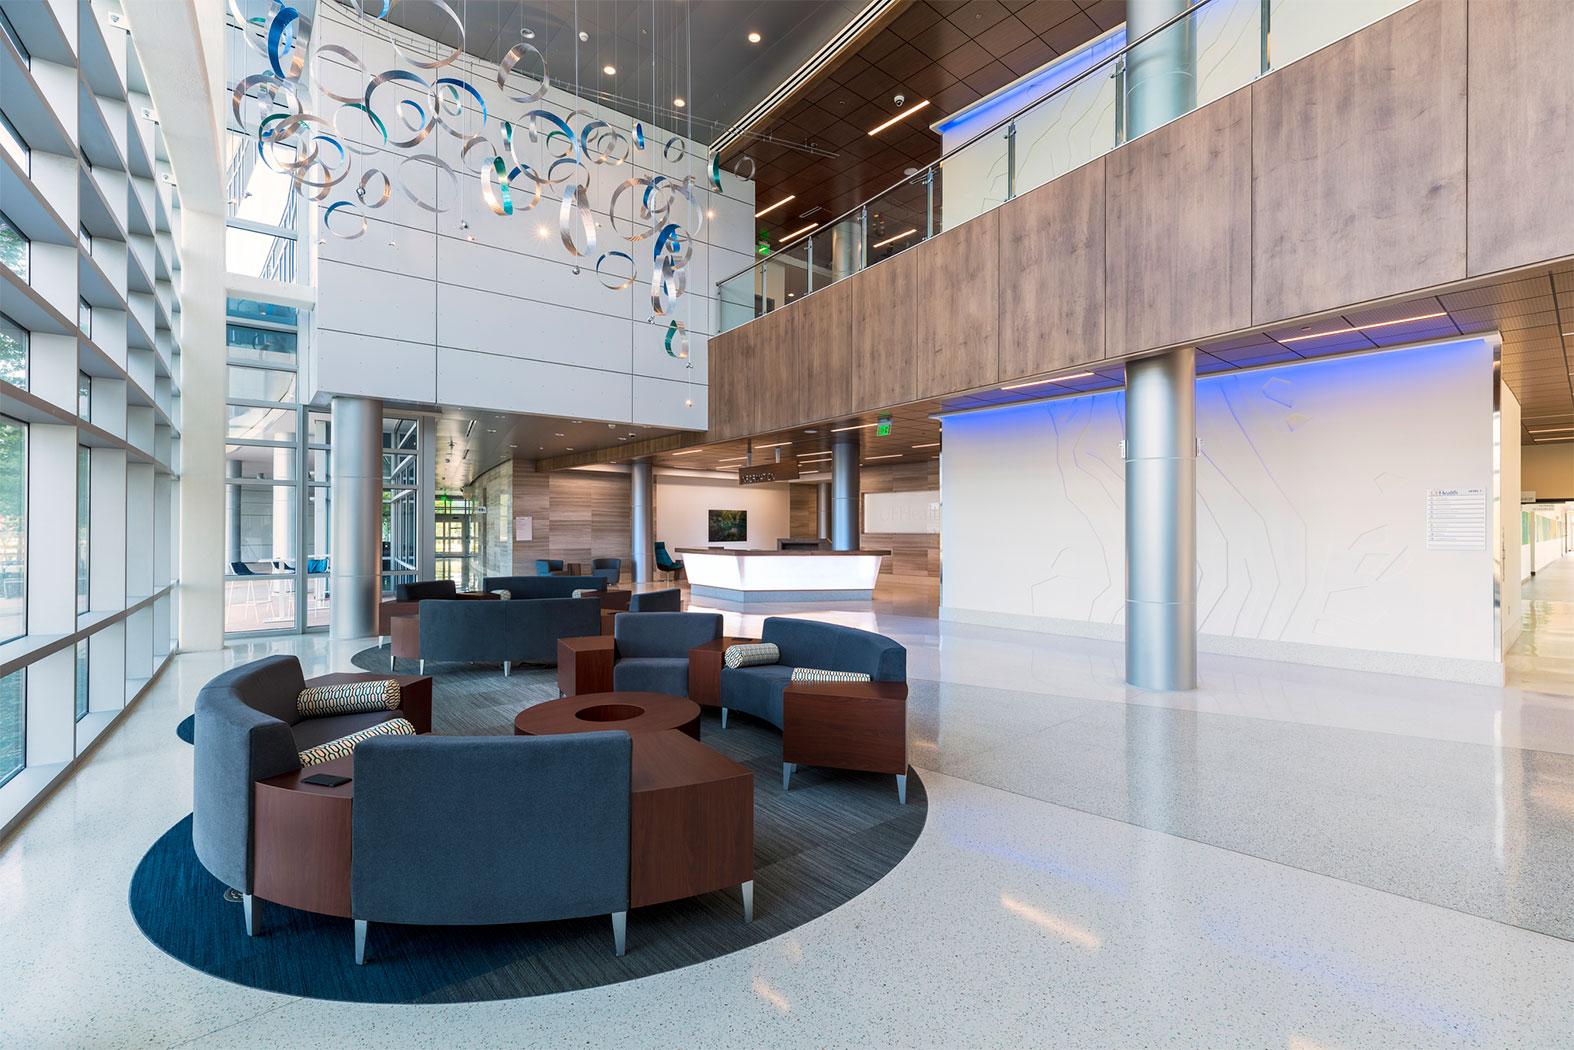 Uf Health North Campus Completes Final Piece Of Campus